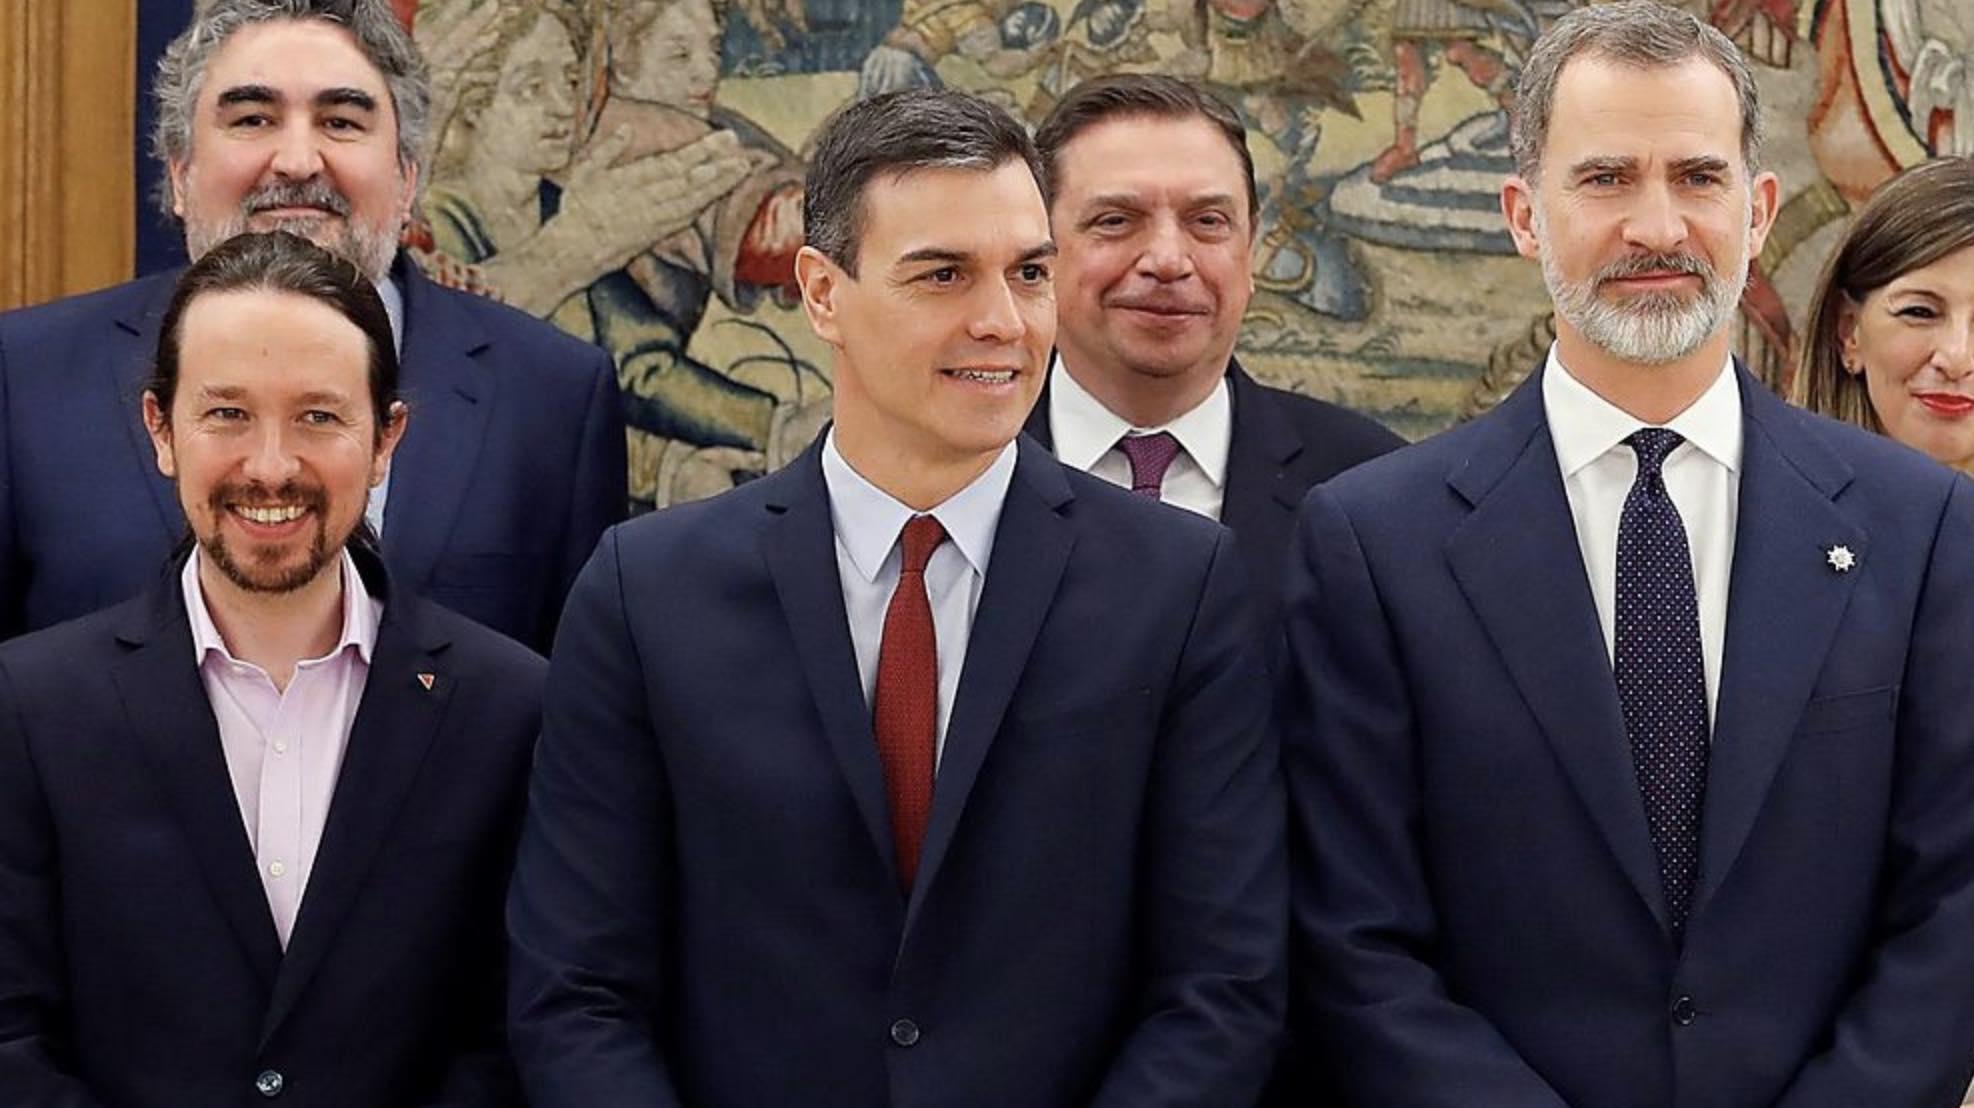 España, Pedro Sánchez, Pablo Iglesias, Populismo